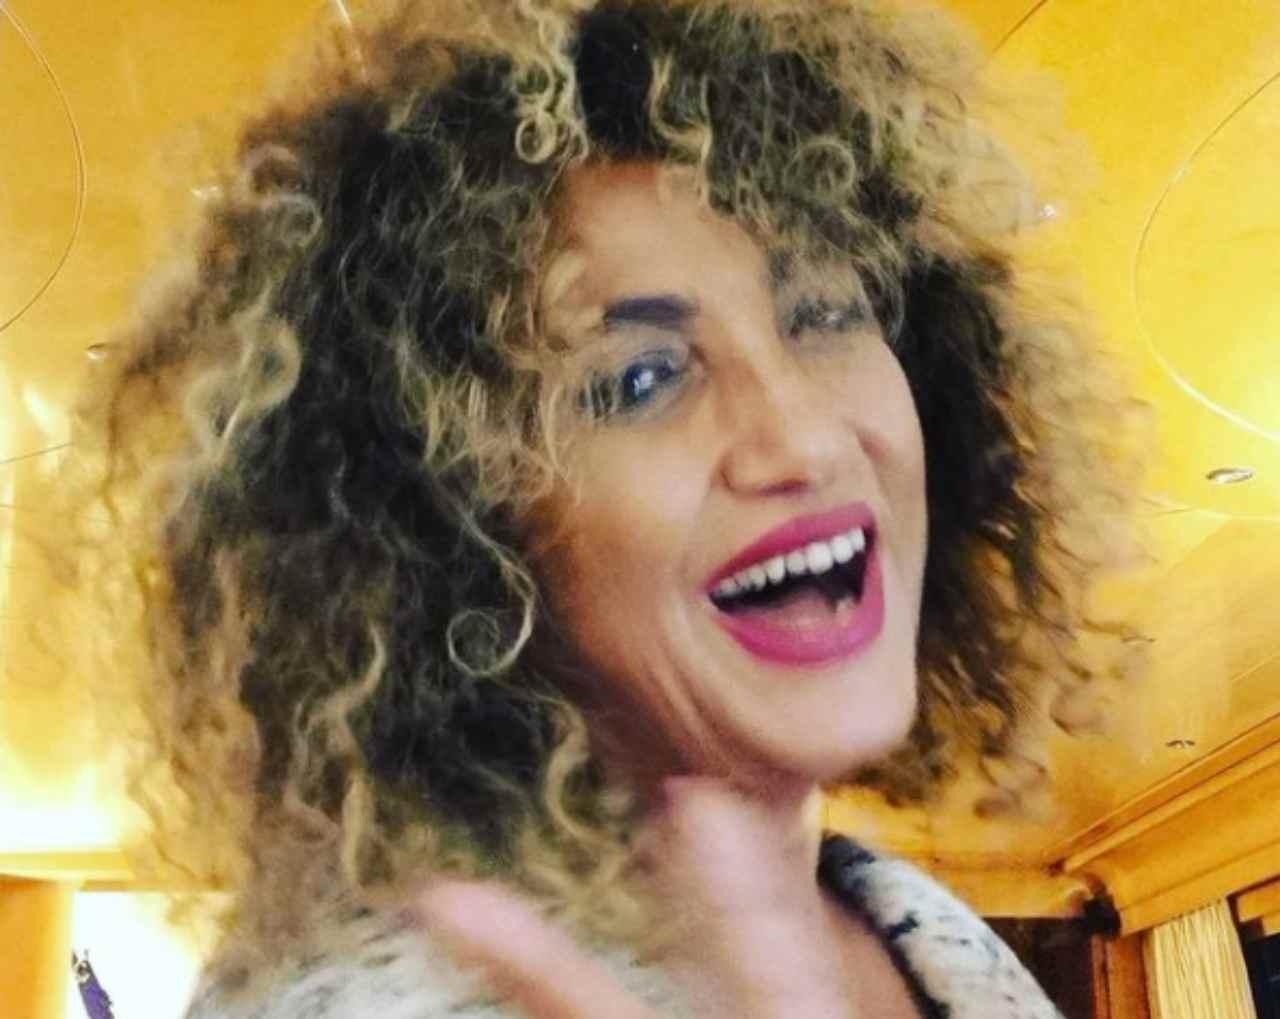 Sanremo 2022, grande artista si candida